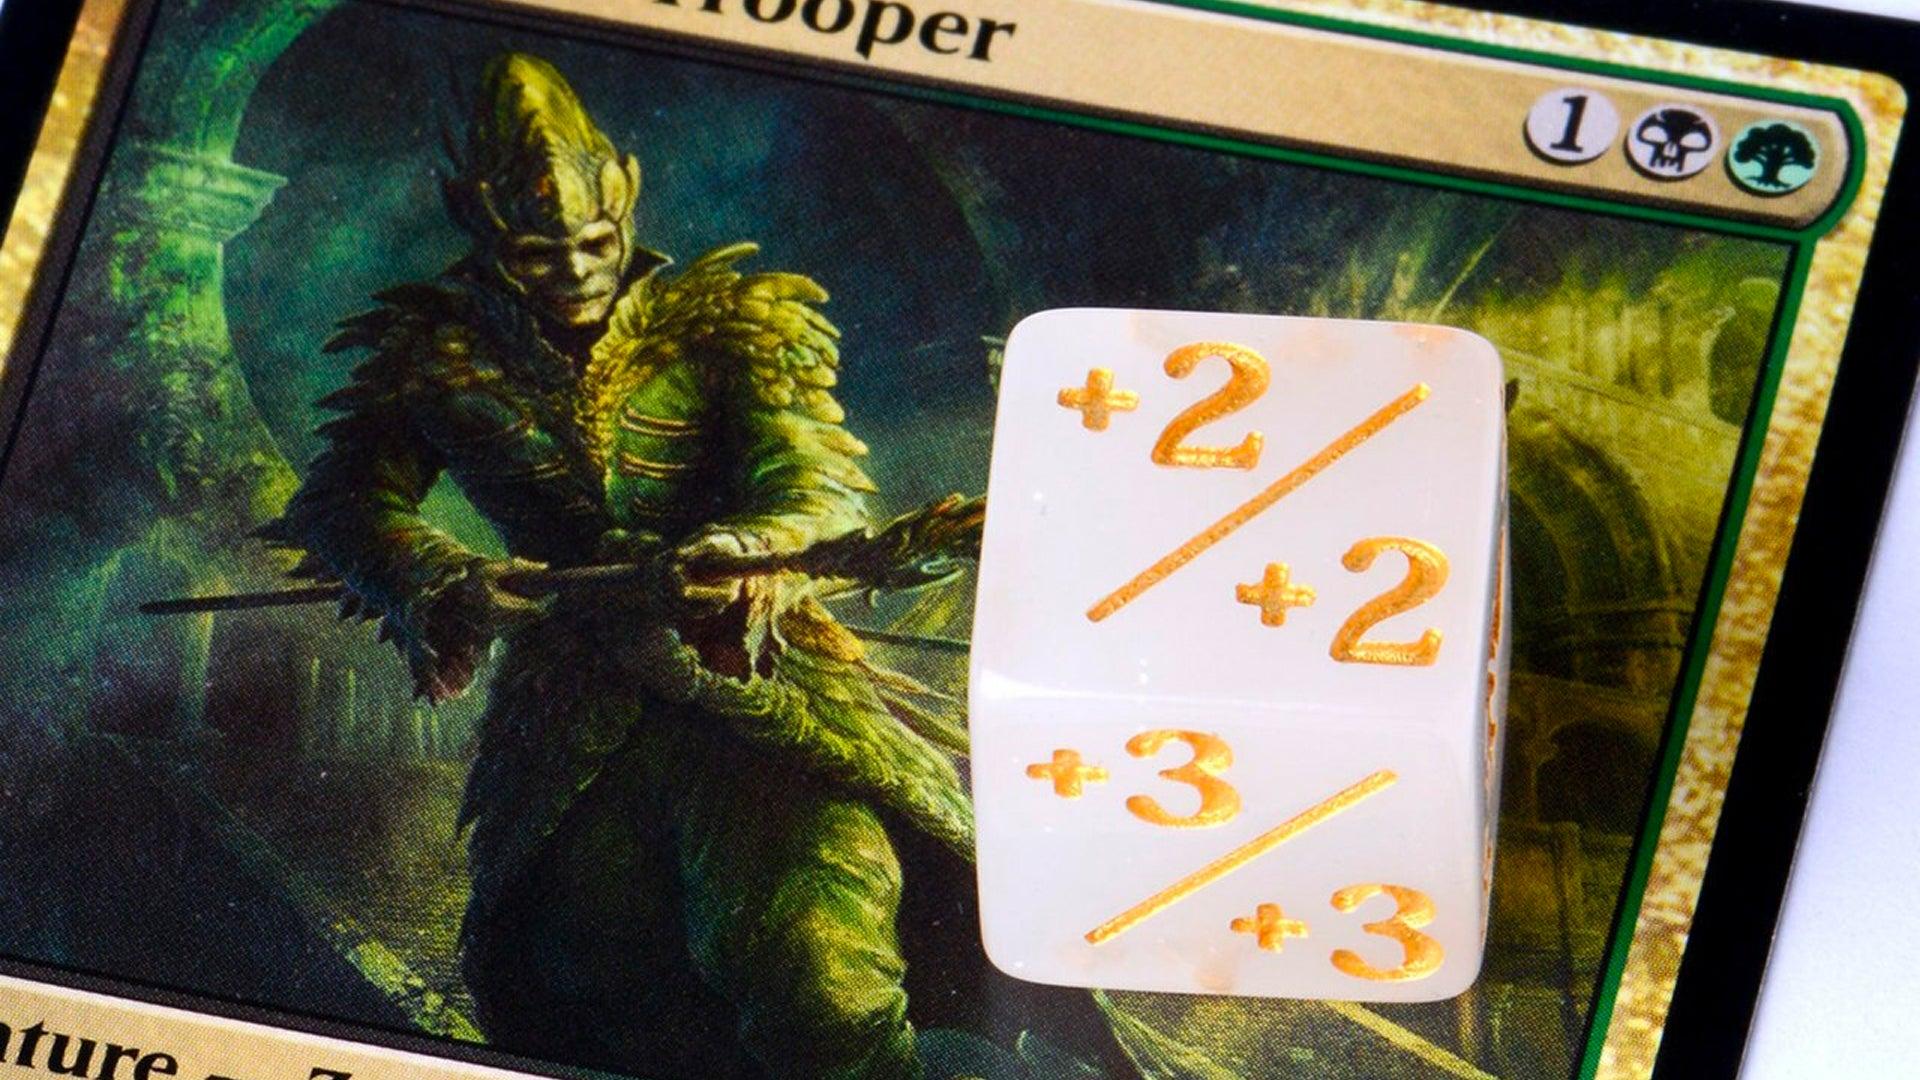 kraken-dice-mtg-token-counter.jpg